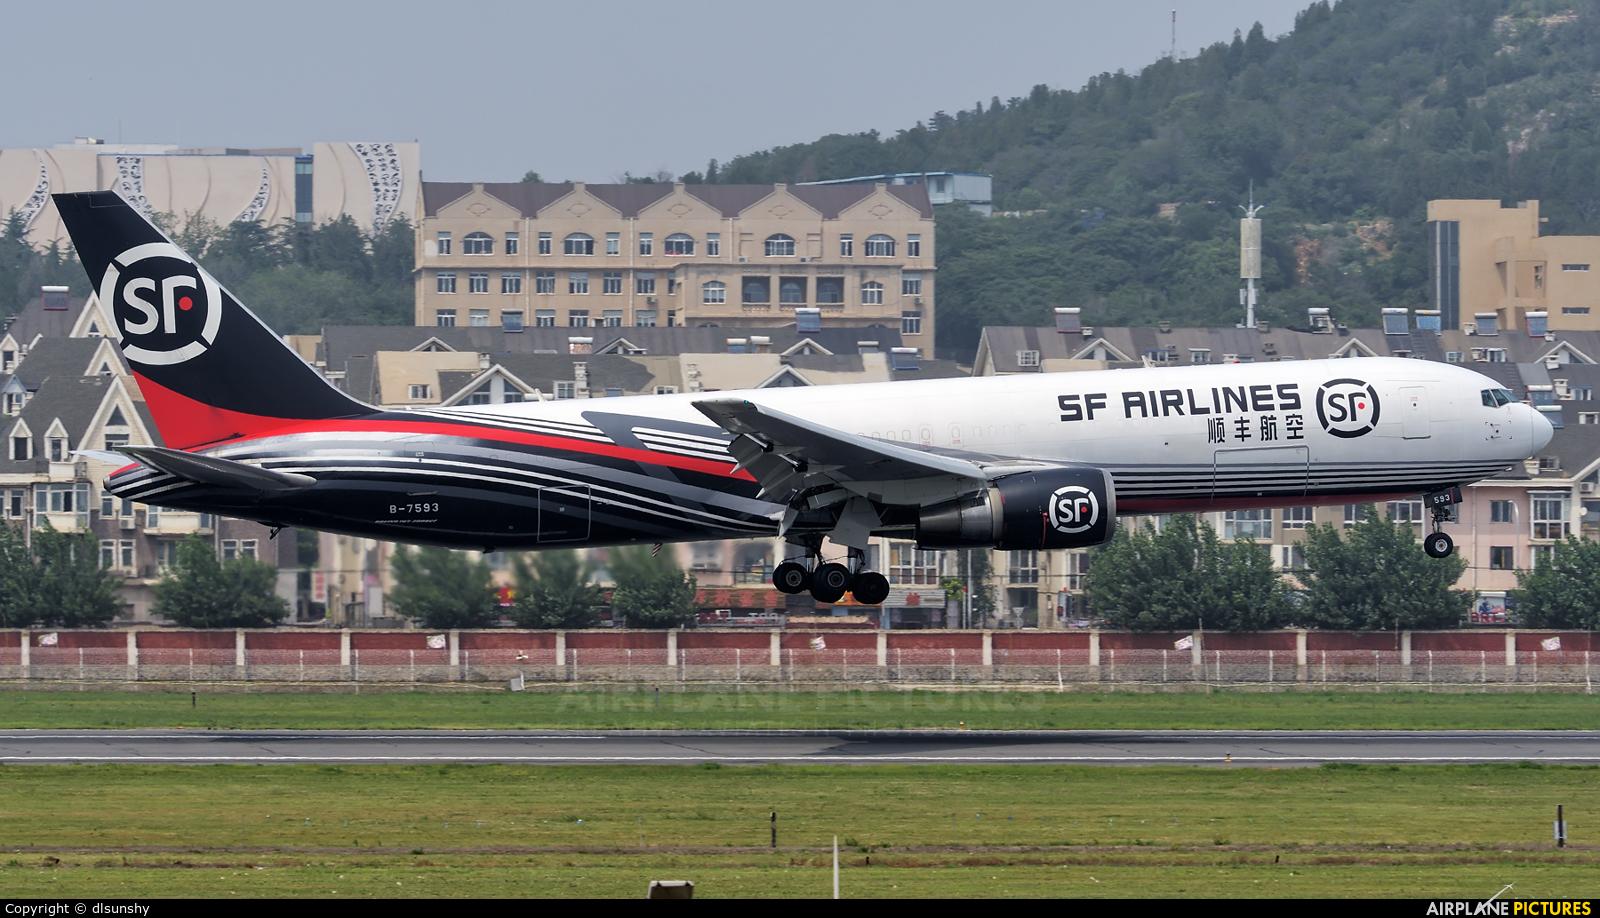 SF Airlines B-7593 aircraft at Dalian Zhoushuizi Int'l